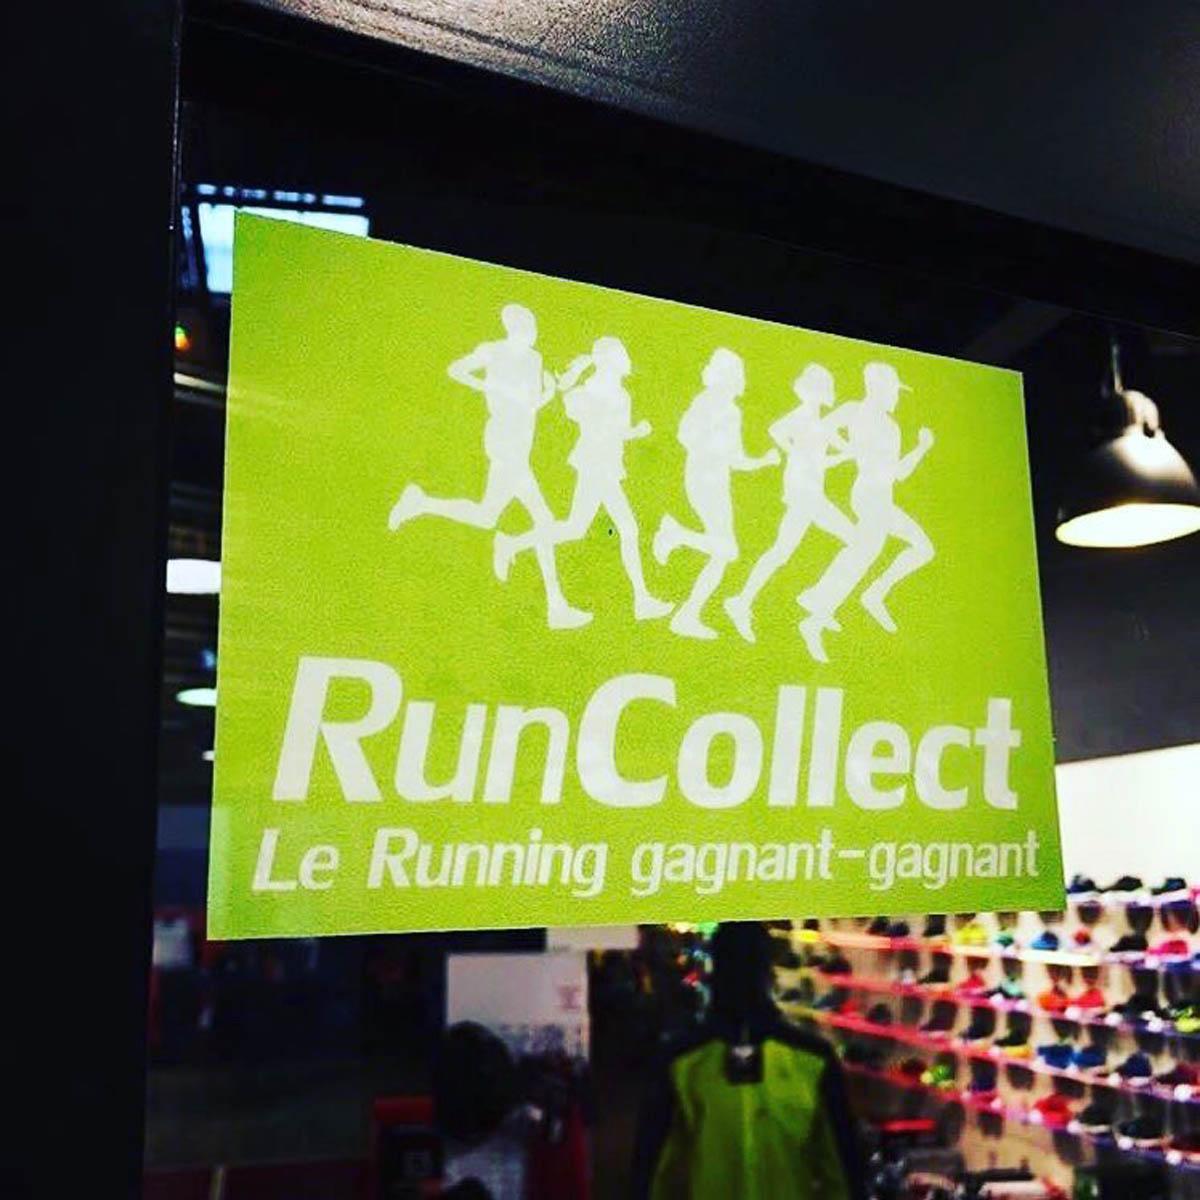 RunCollect